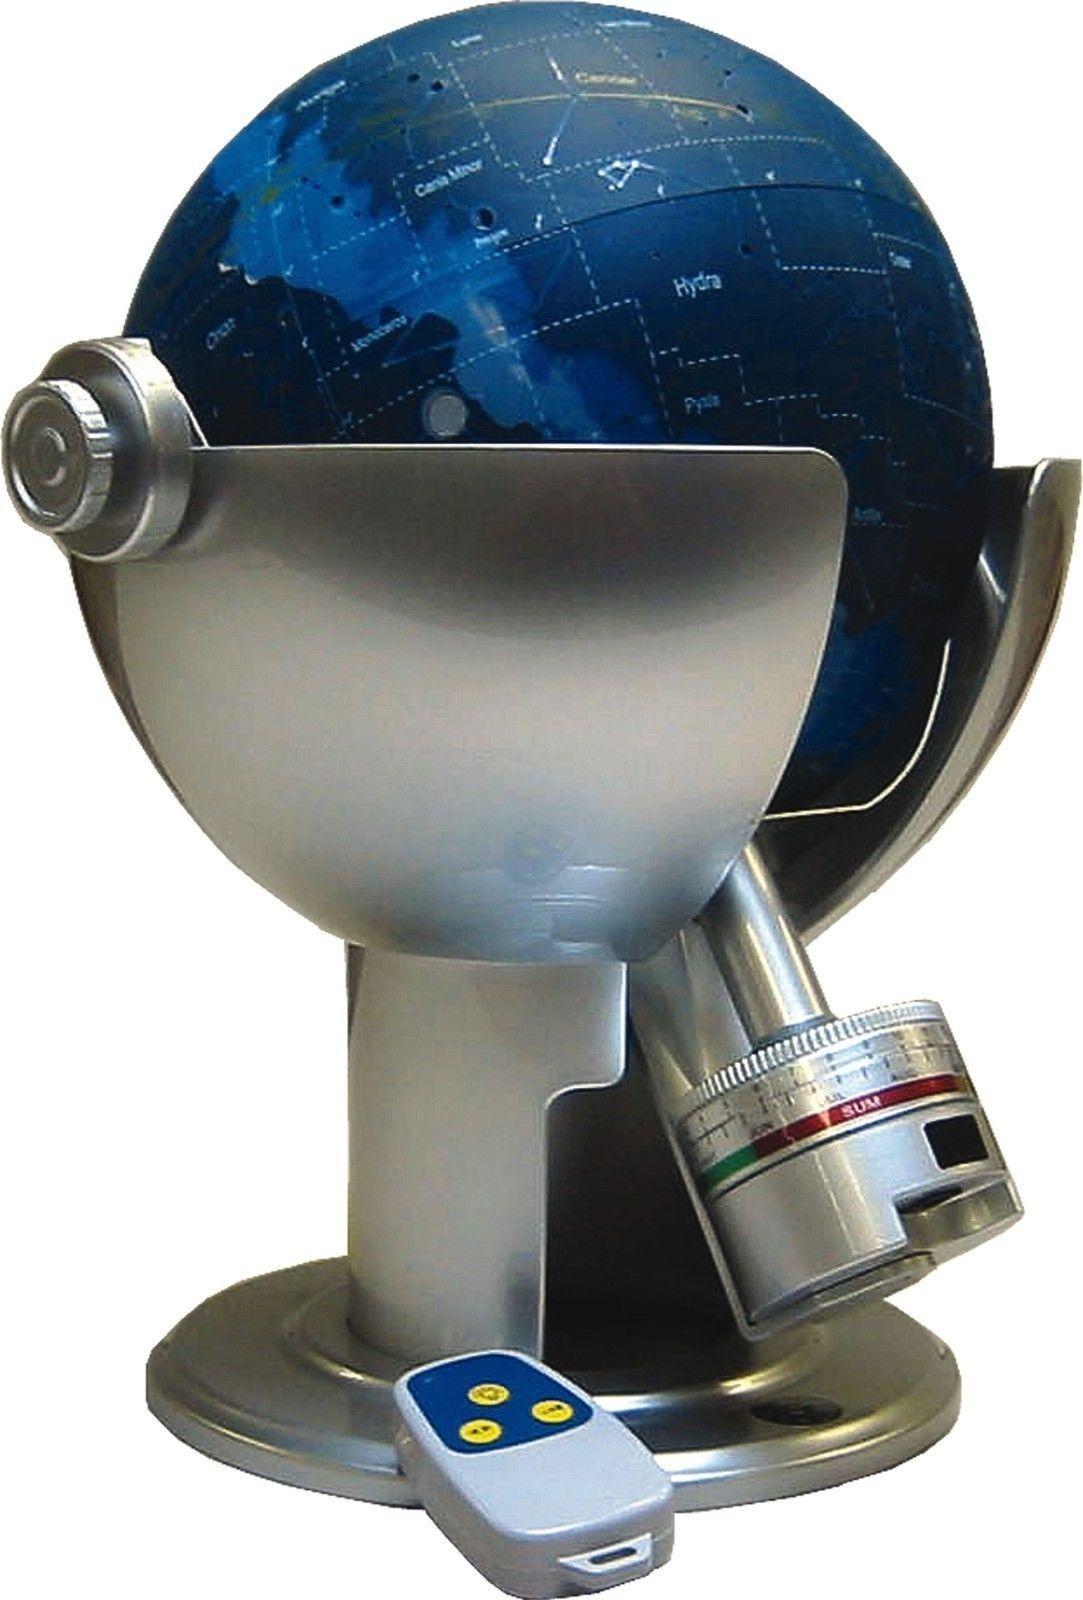 Remote Control Home Planetarium Astronomy Space ...